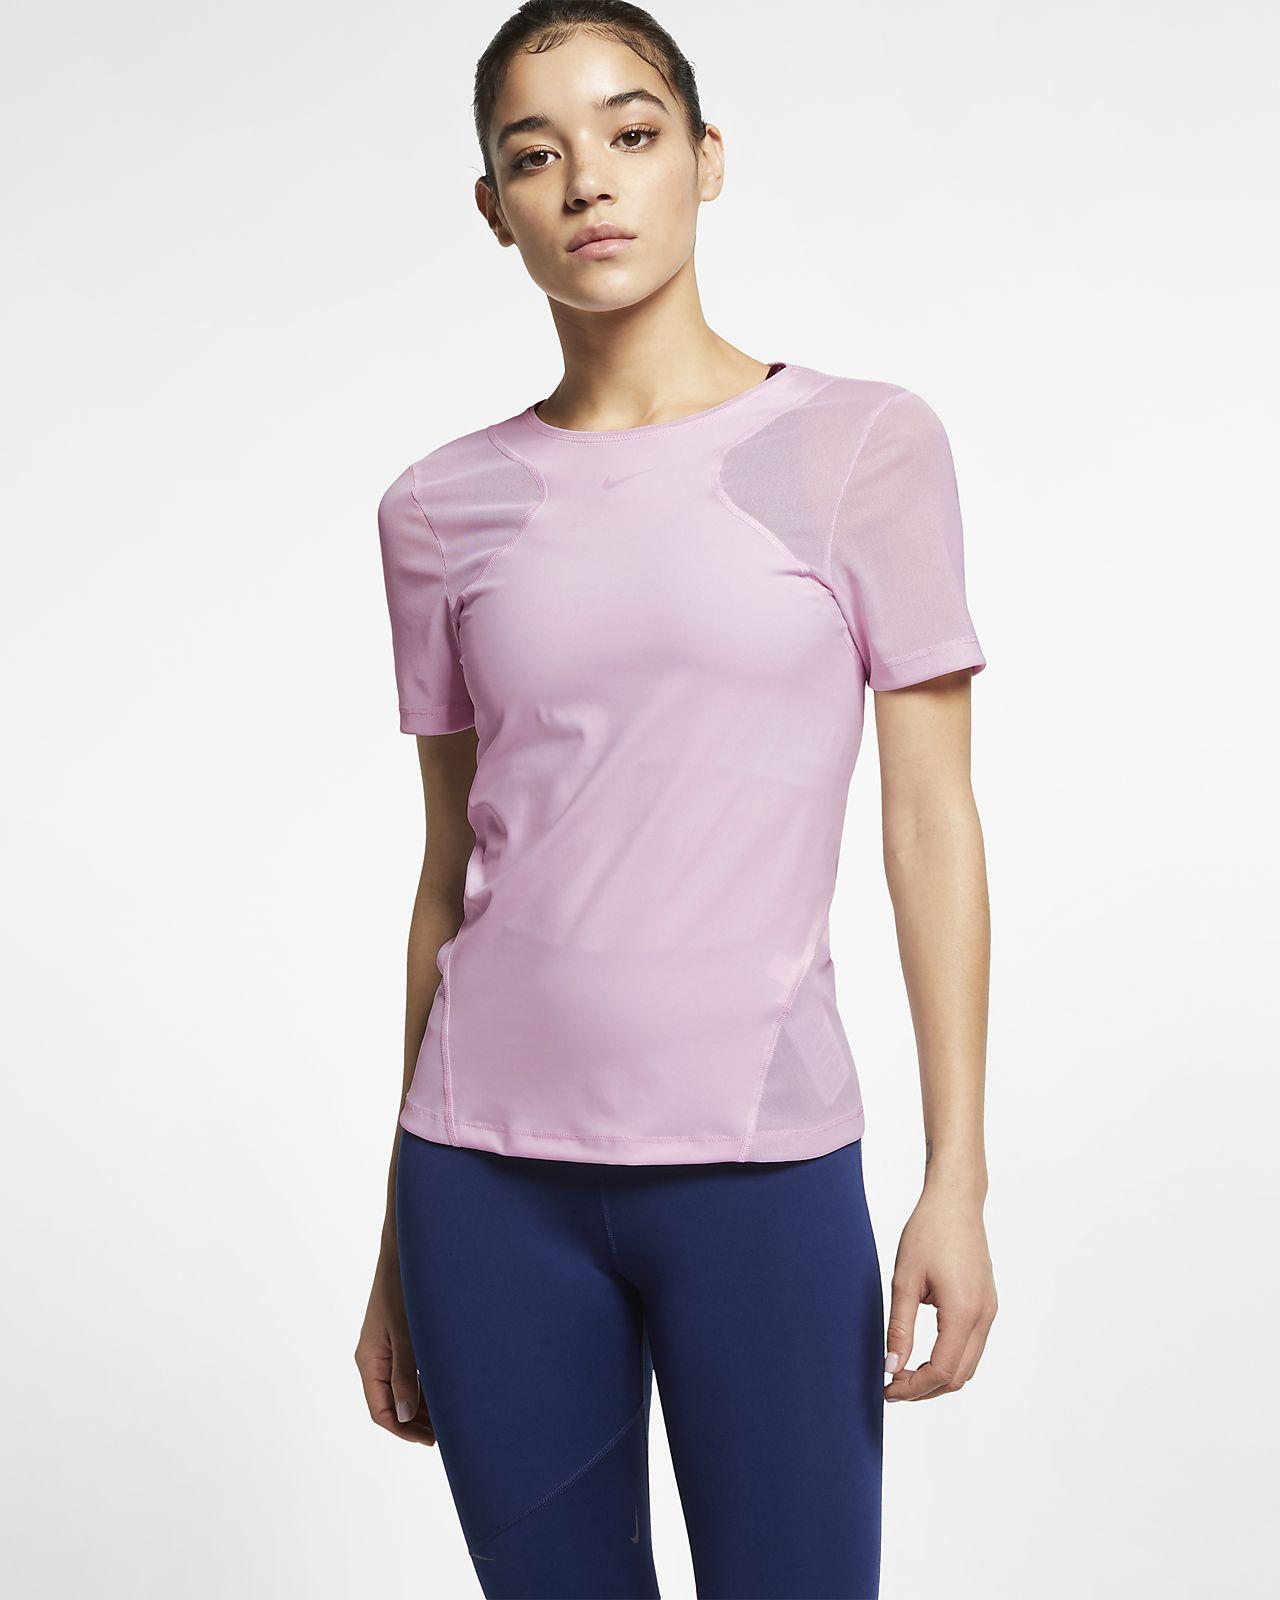 042e545a628d Γυναικεία κοντομάνικη μπλούζα Nike Pro HyperCool. Nike.com GR